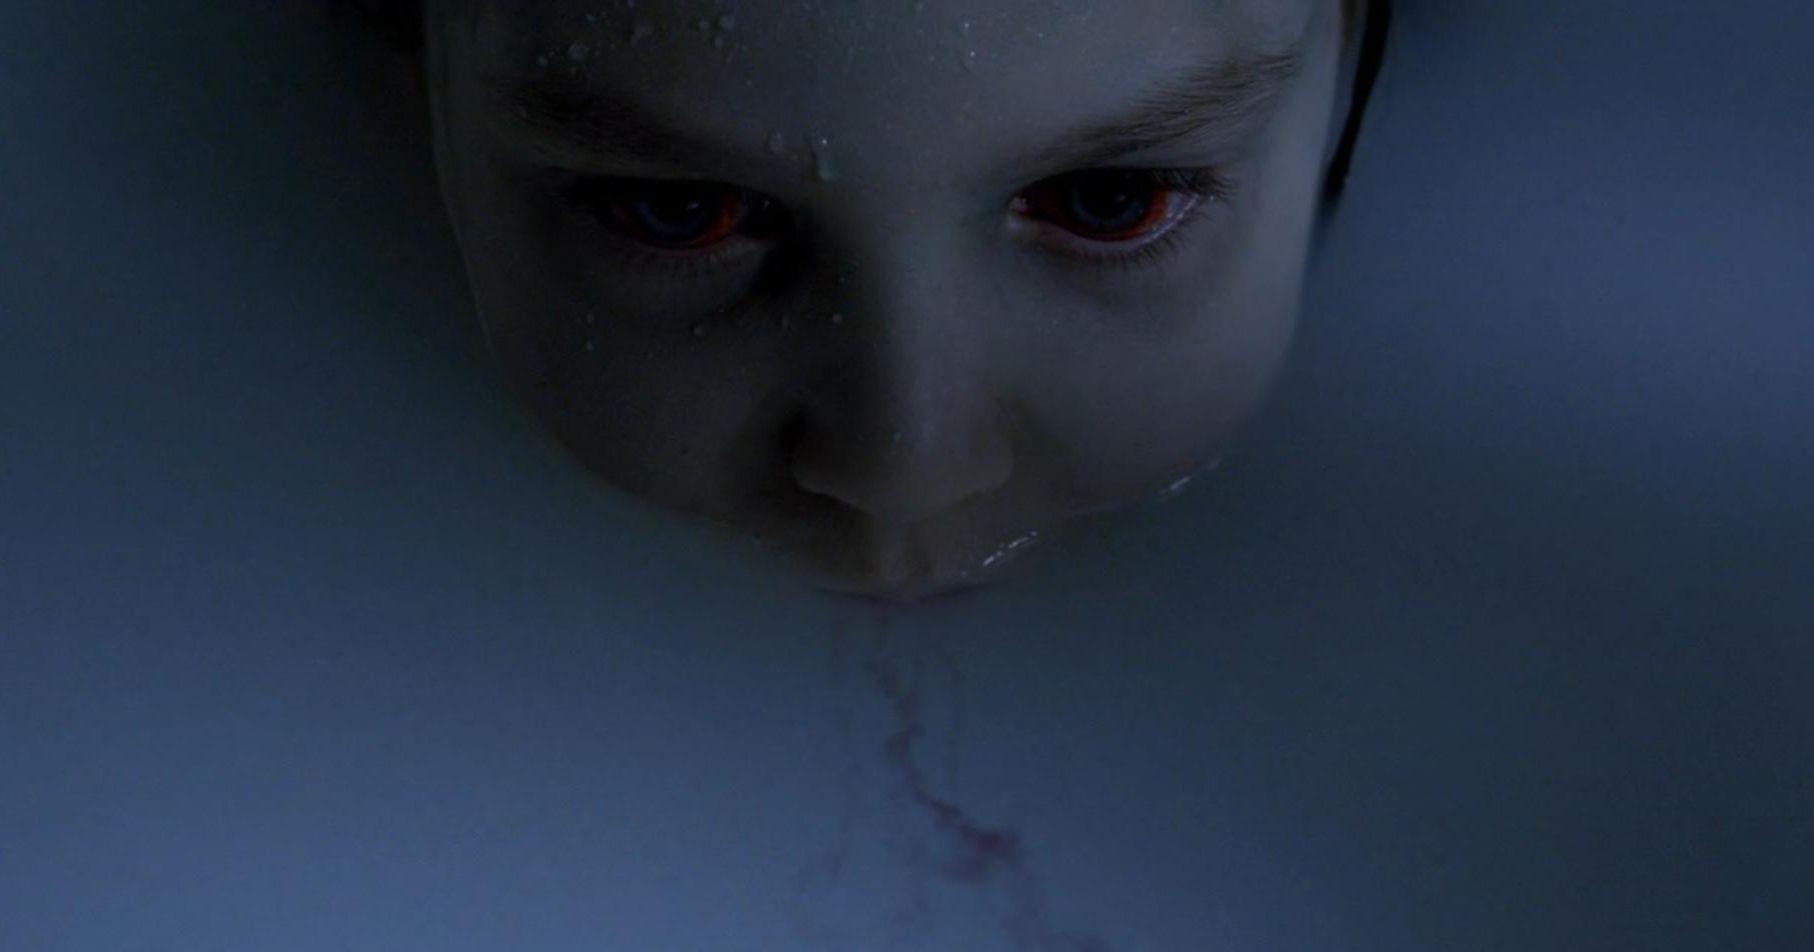 Scary little strigoi in the bathtub. The Strain